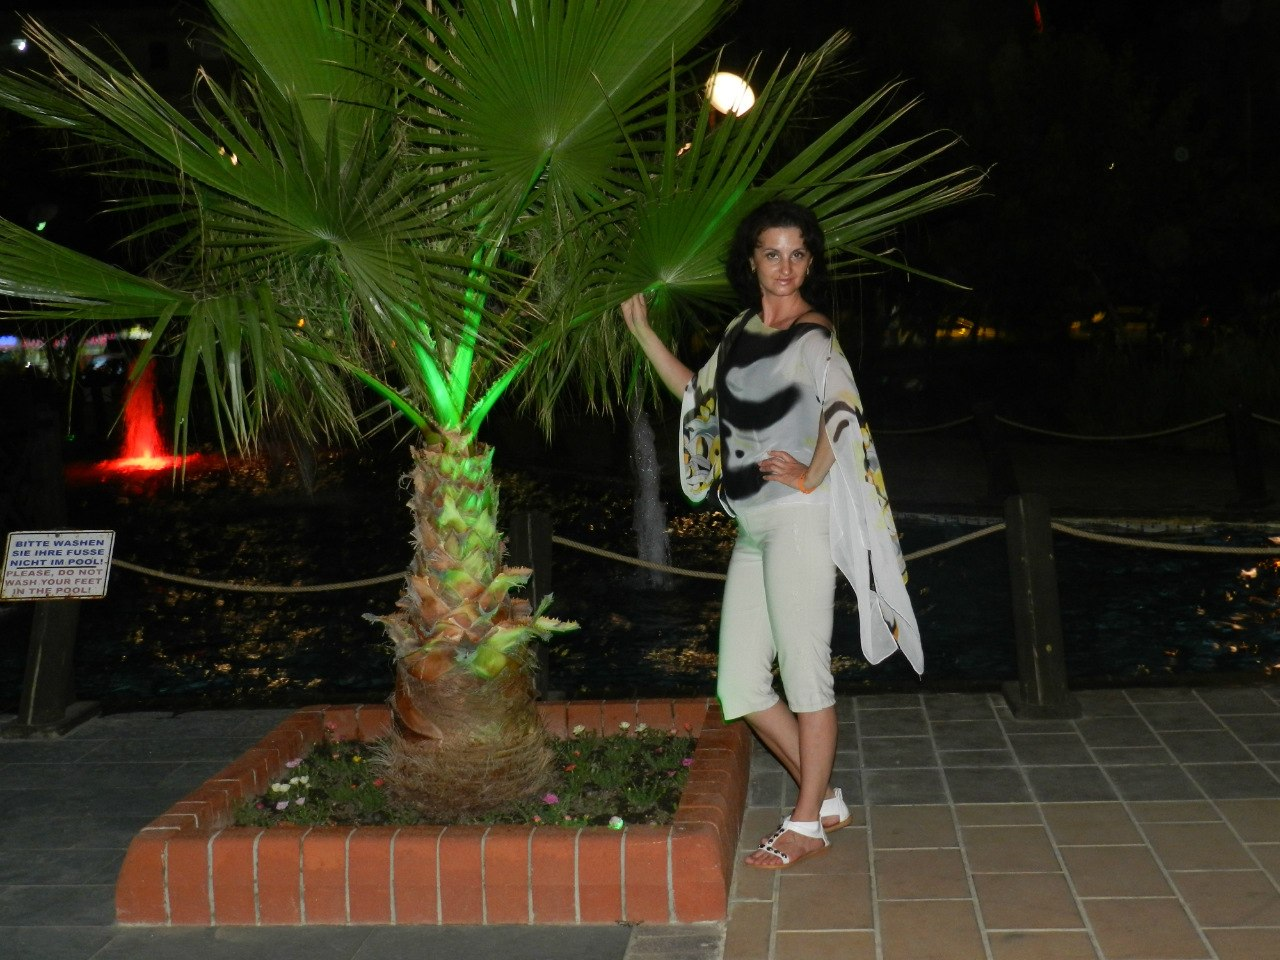 photo from album of Svetlana Gileva №9